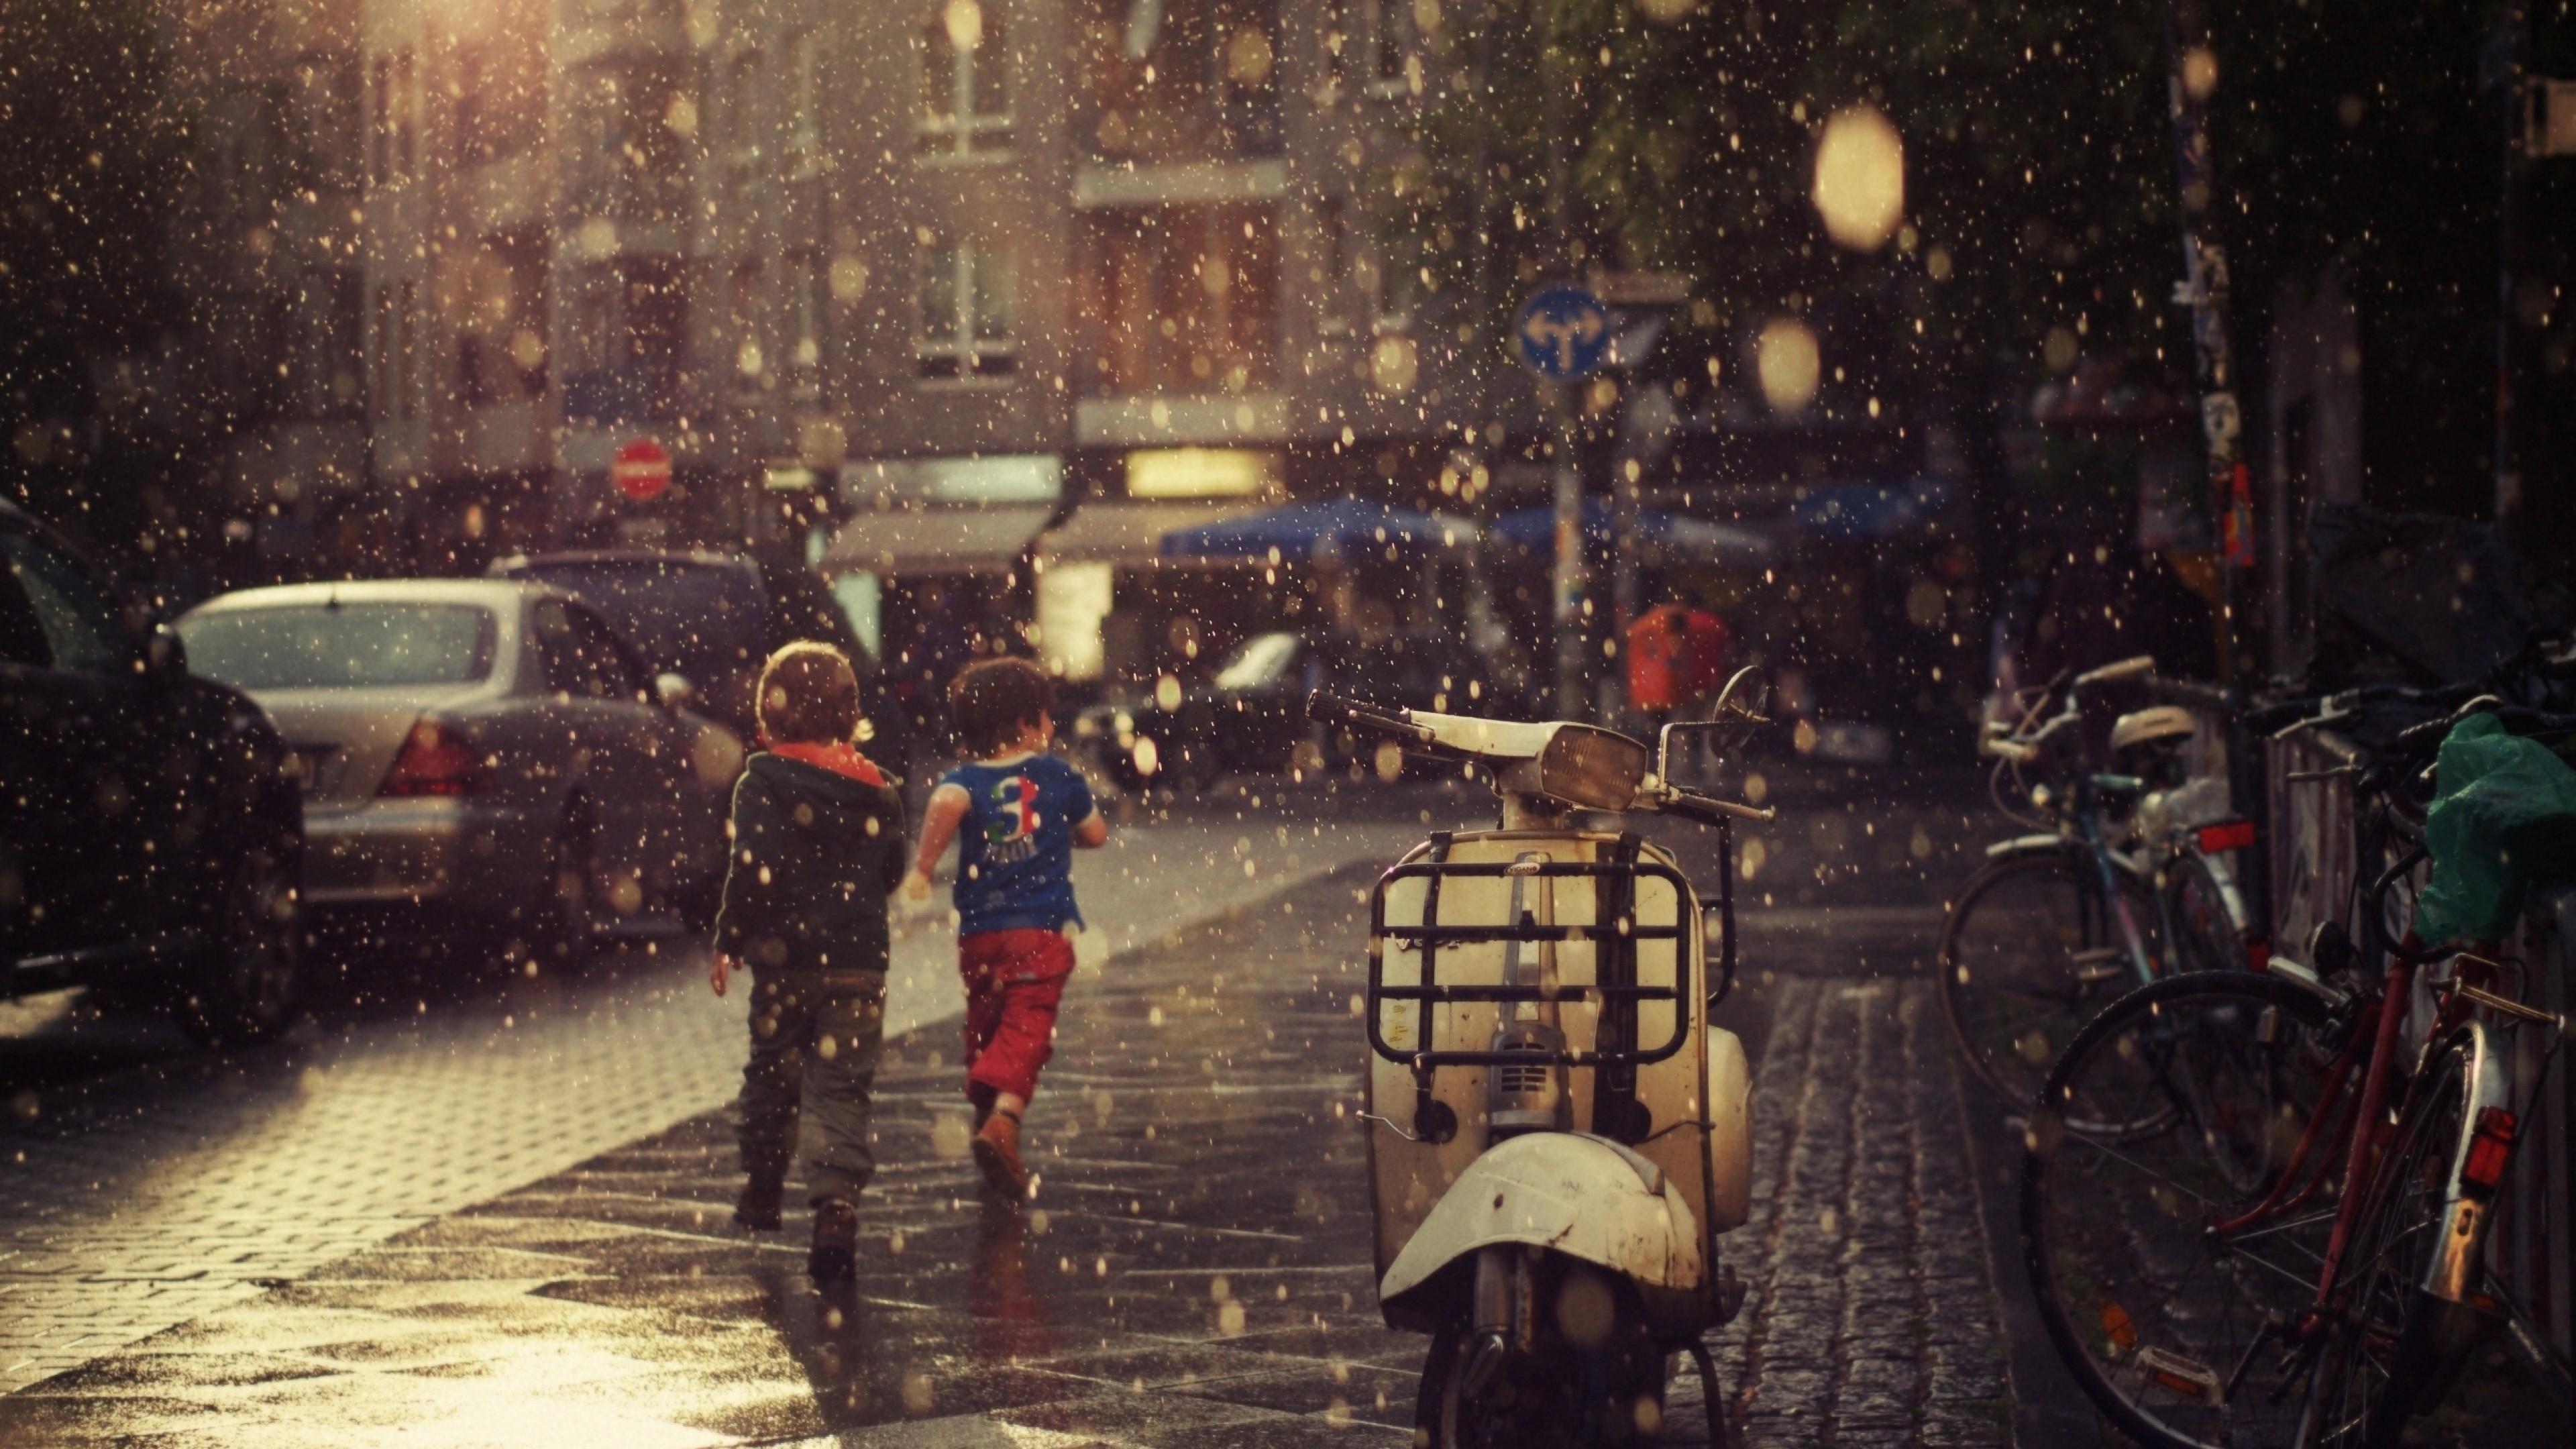 Wallpaper street, children, running, rain, city